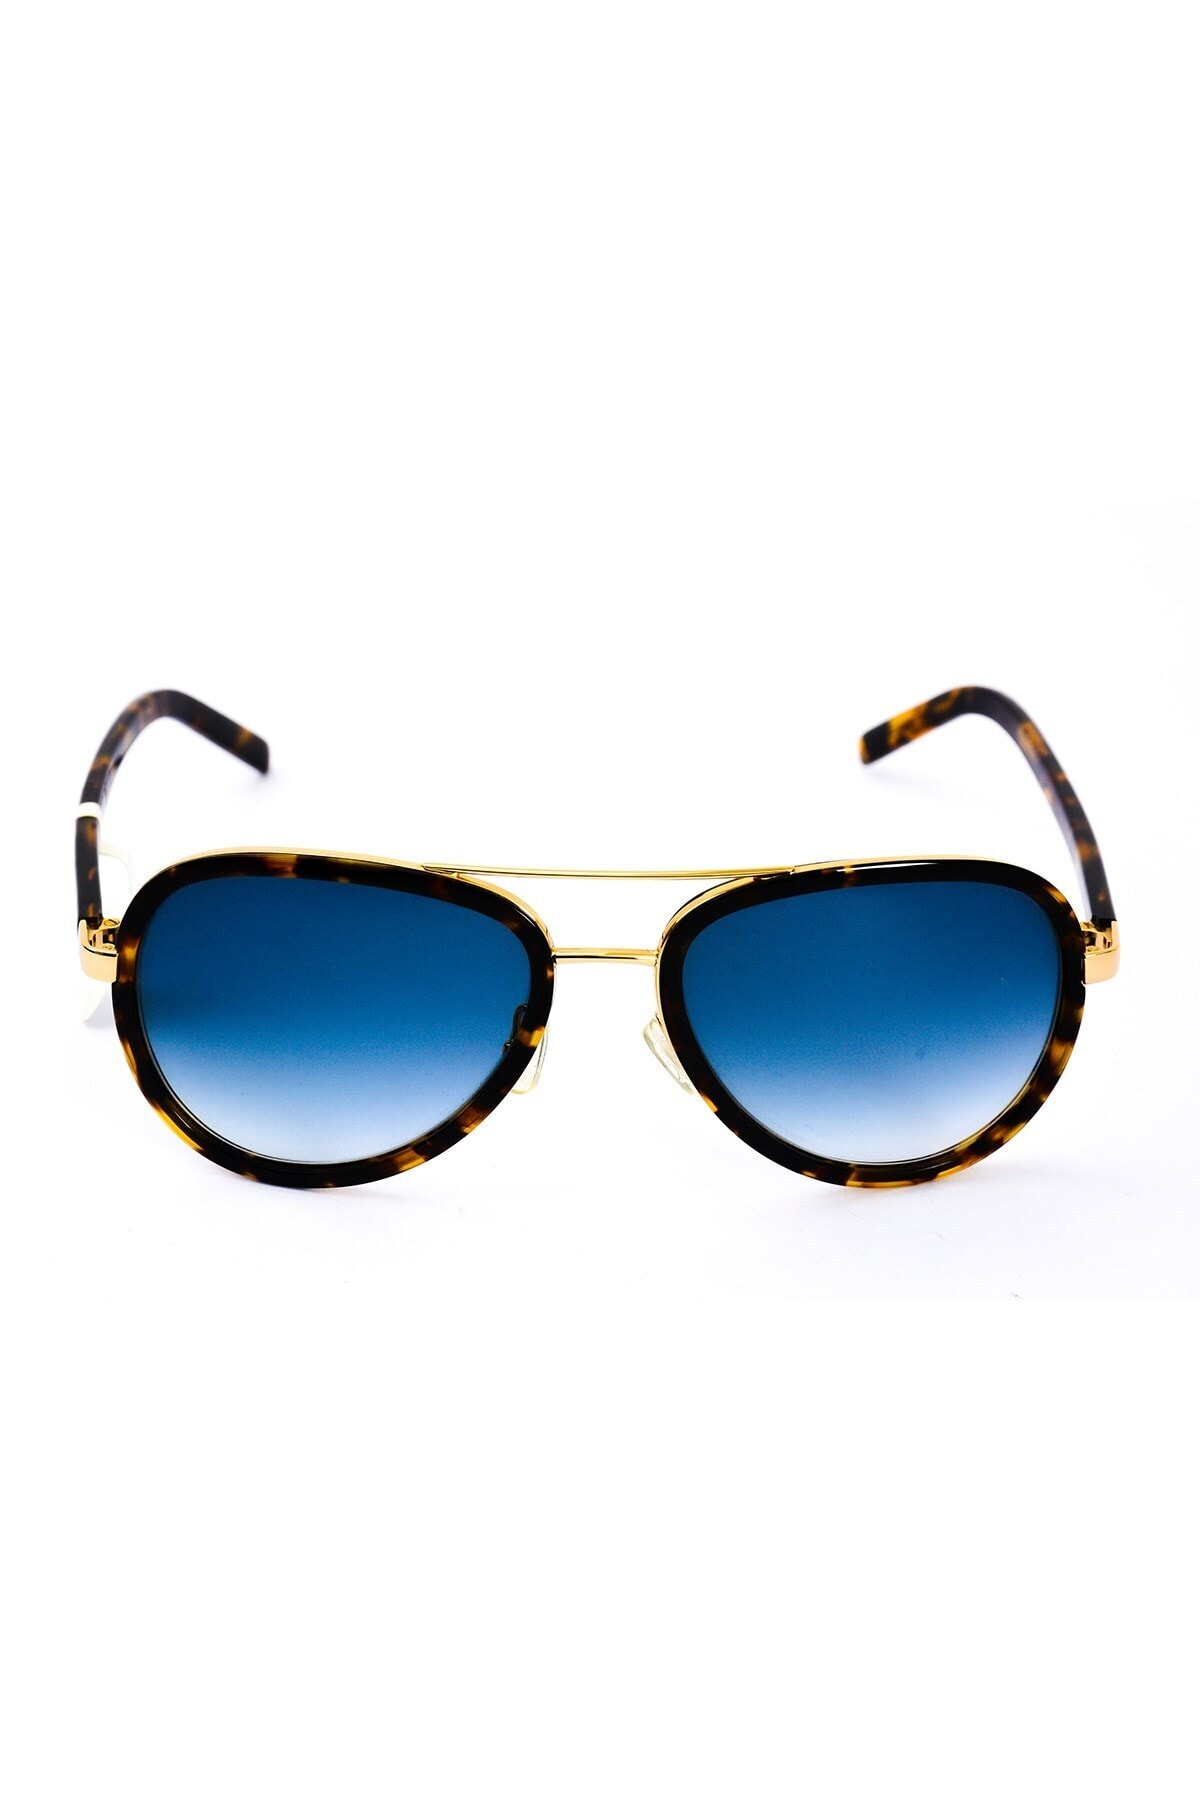 Laura Ashley Unisex Mavi La Troy Güneş Gözlüğü 6 55-18 1